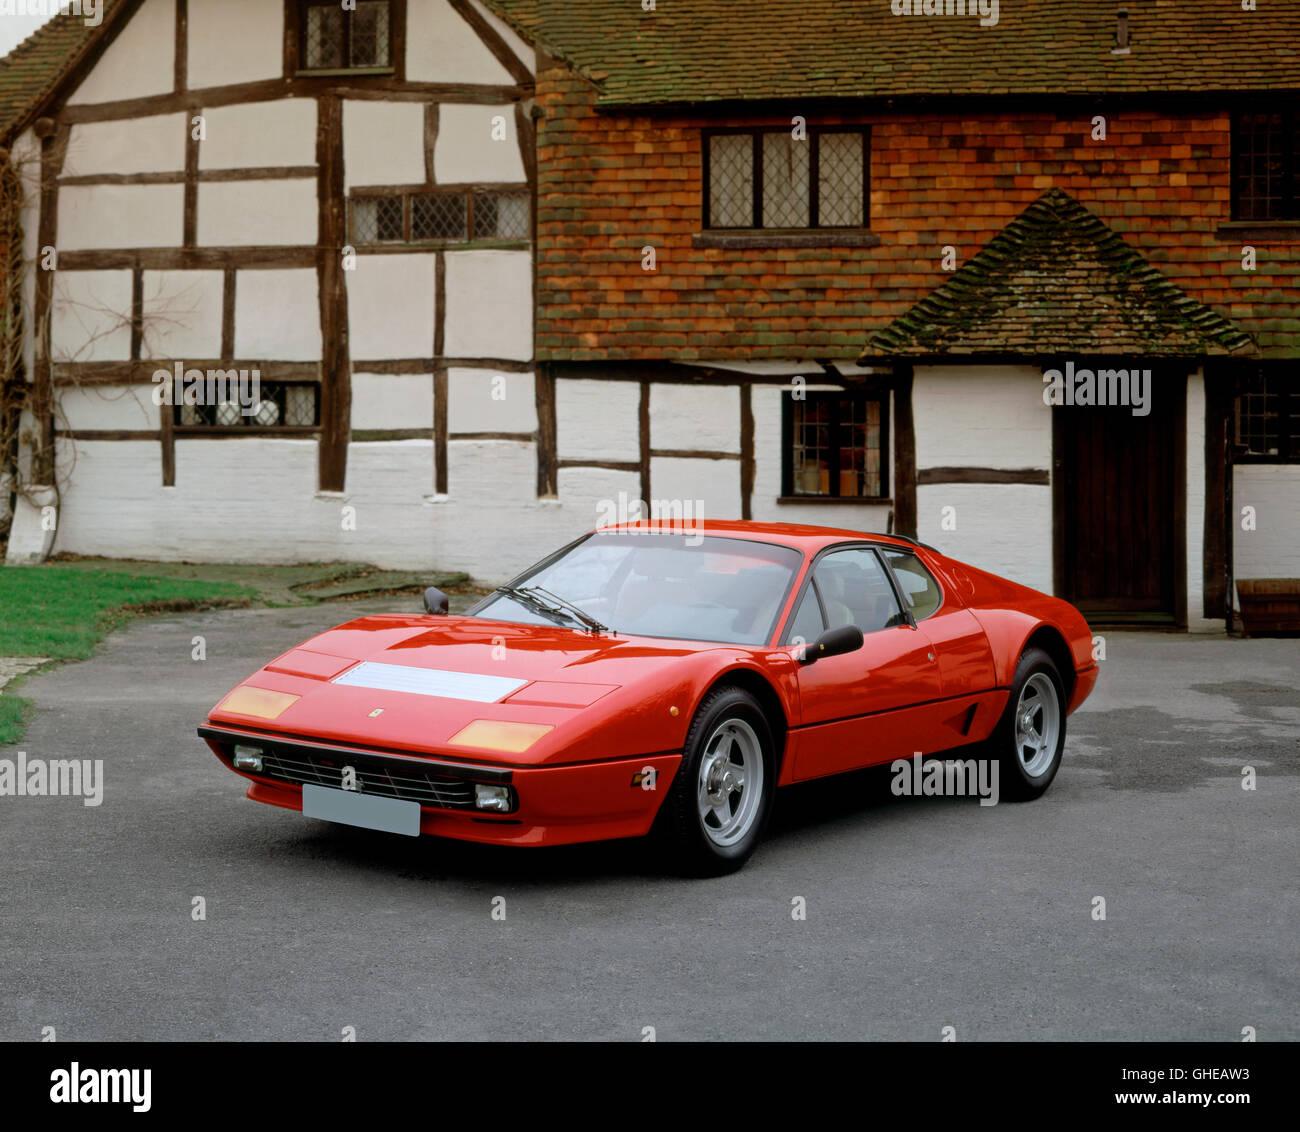 1984 Ferrari 512i BB Boxer Berlinetta 5 litre V12 engine developing 340bhp Country of origin Italy - Stock Image